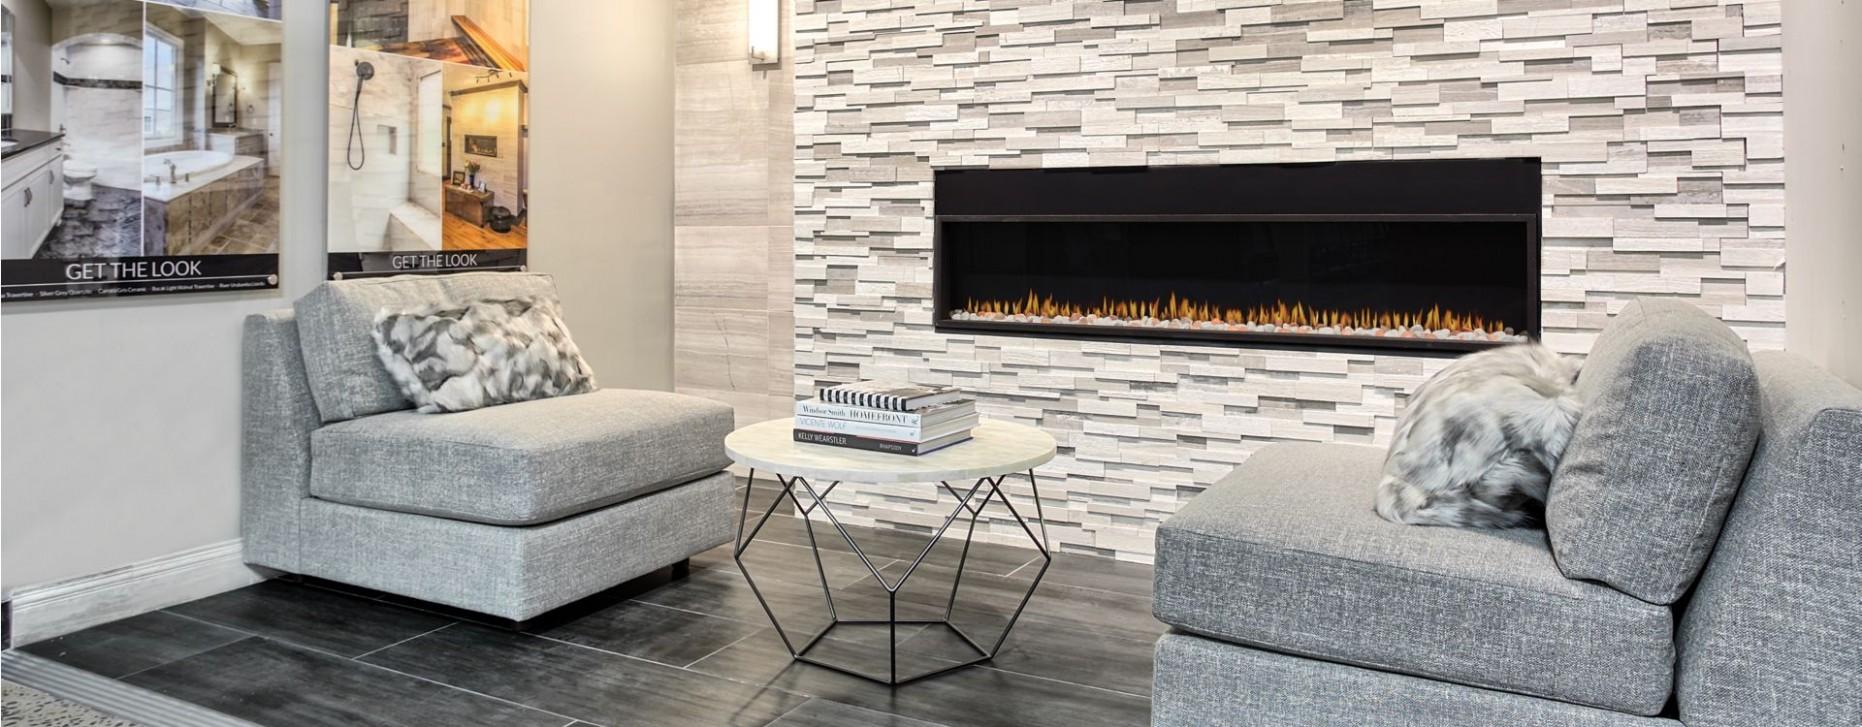 Living Room Tile Designs, Trends & Ideas for 12 – The Tile Shop - Dining Room Tile Ideas